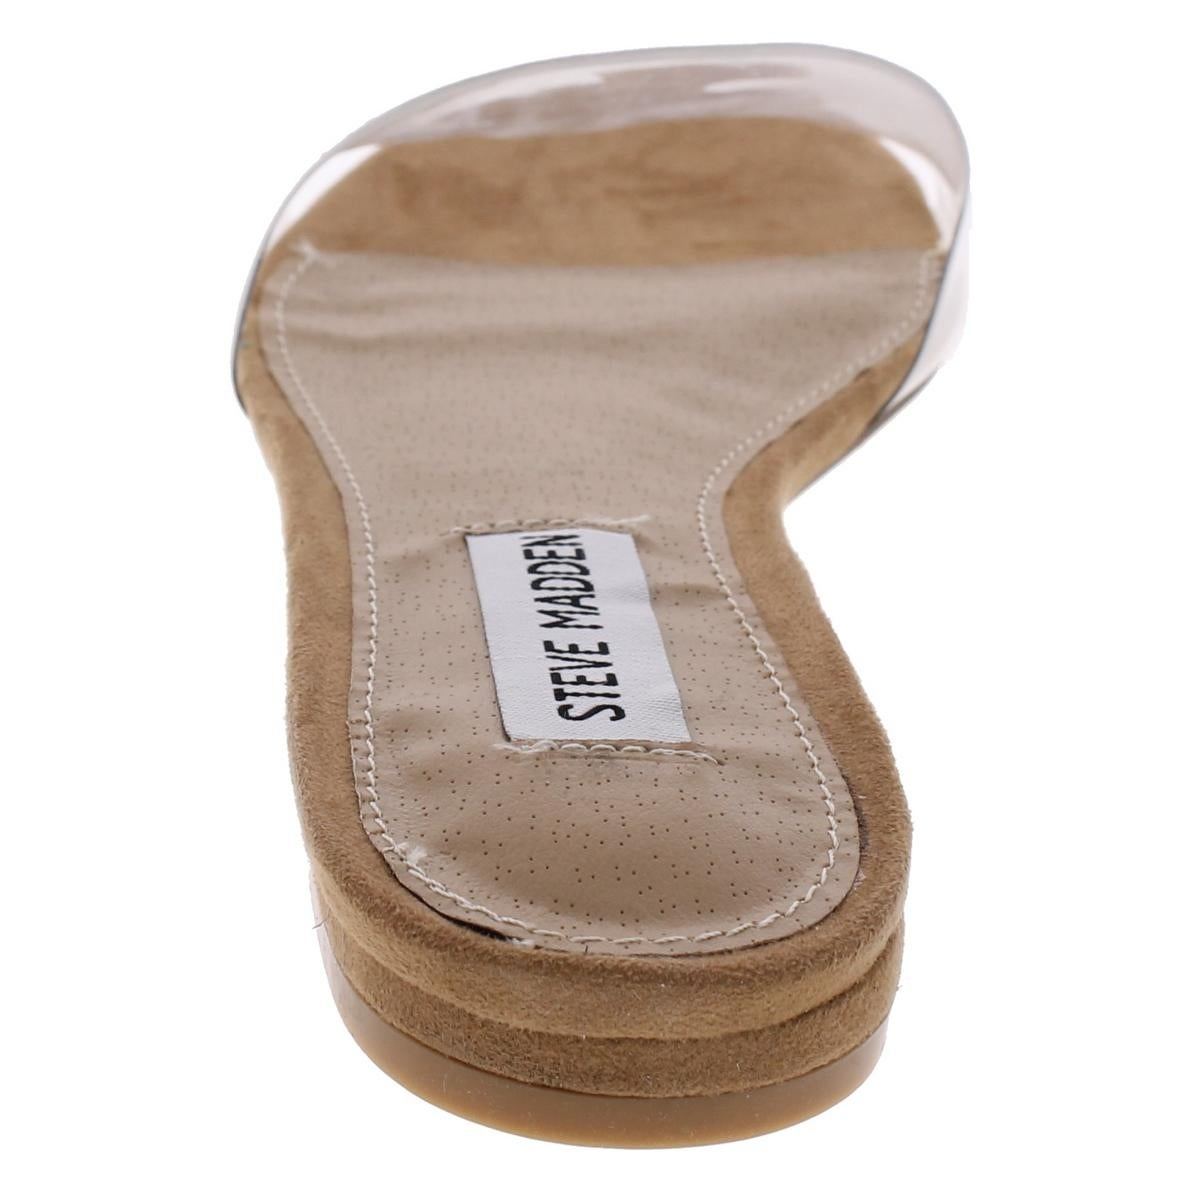 38f35d5aca0 Steve Madden Womens Joyce Flat Sandals Open Toe Casual